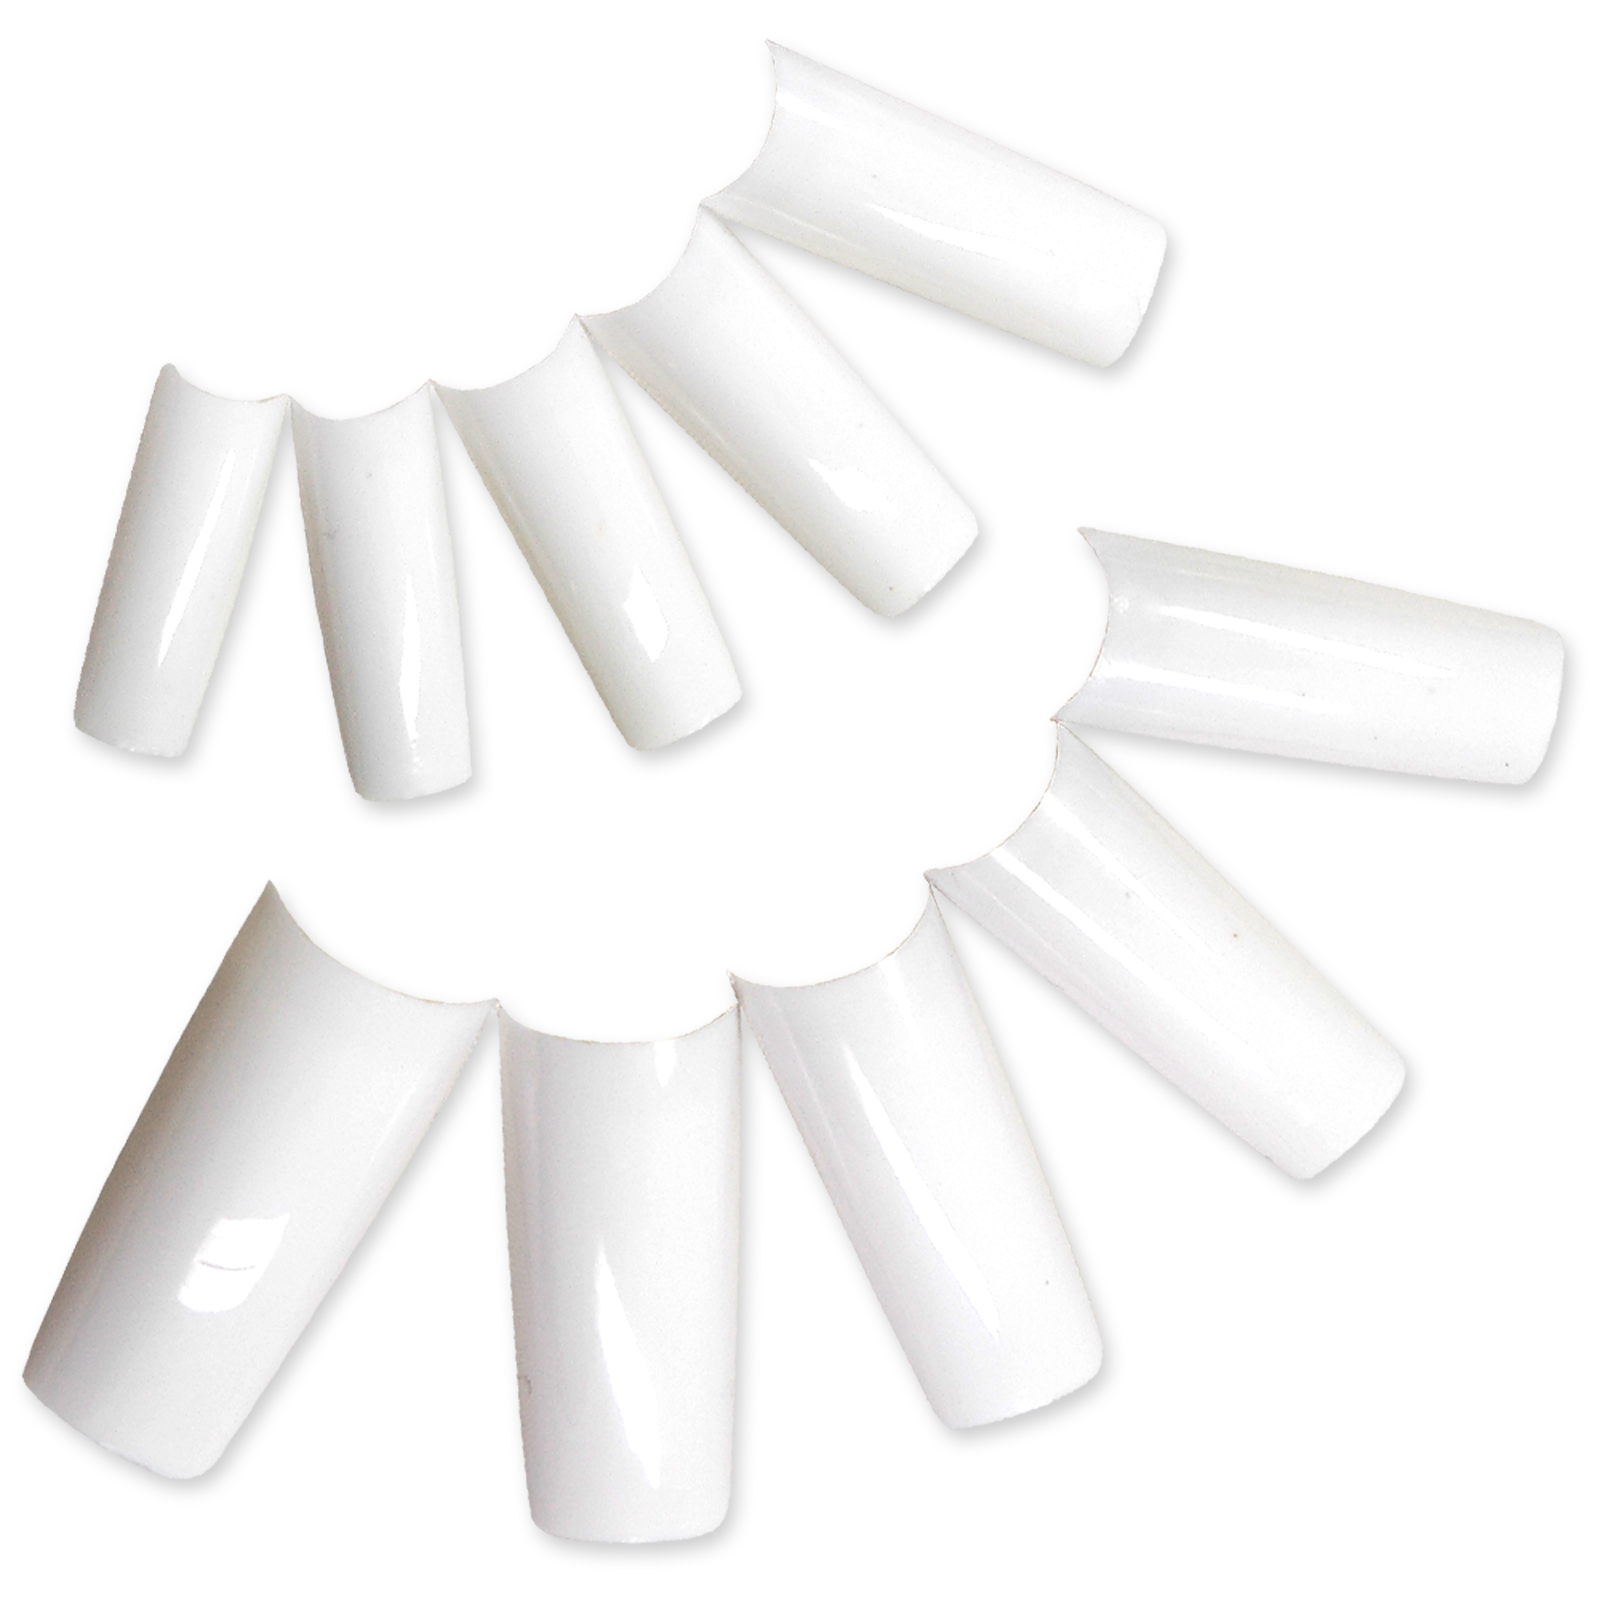 500st k nstliche fingern gel weiss nail tips im box french nagel set ebay. Black Bedroom Furniture Sets. Home Design Ideas